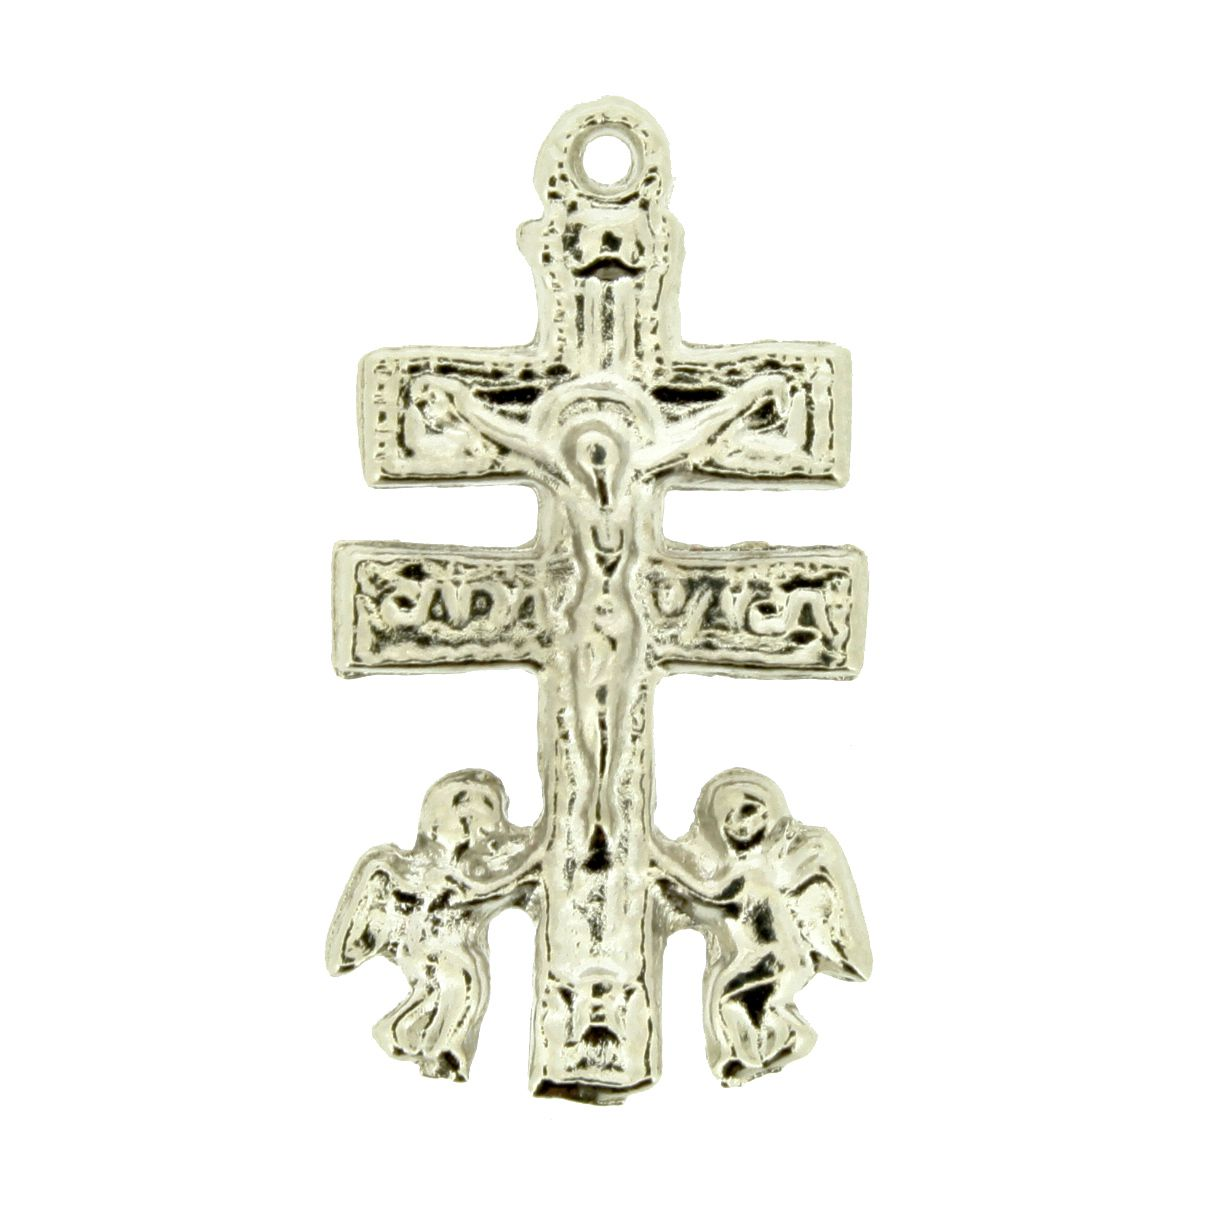 Cruz de Caravaca - Níquel - 28mm - 01 Peça  - Stéphanie Bijoux® - Peças para Bijuterias e Artesanato